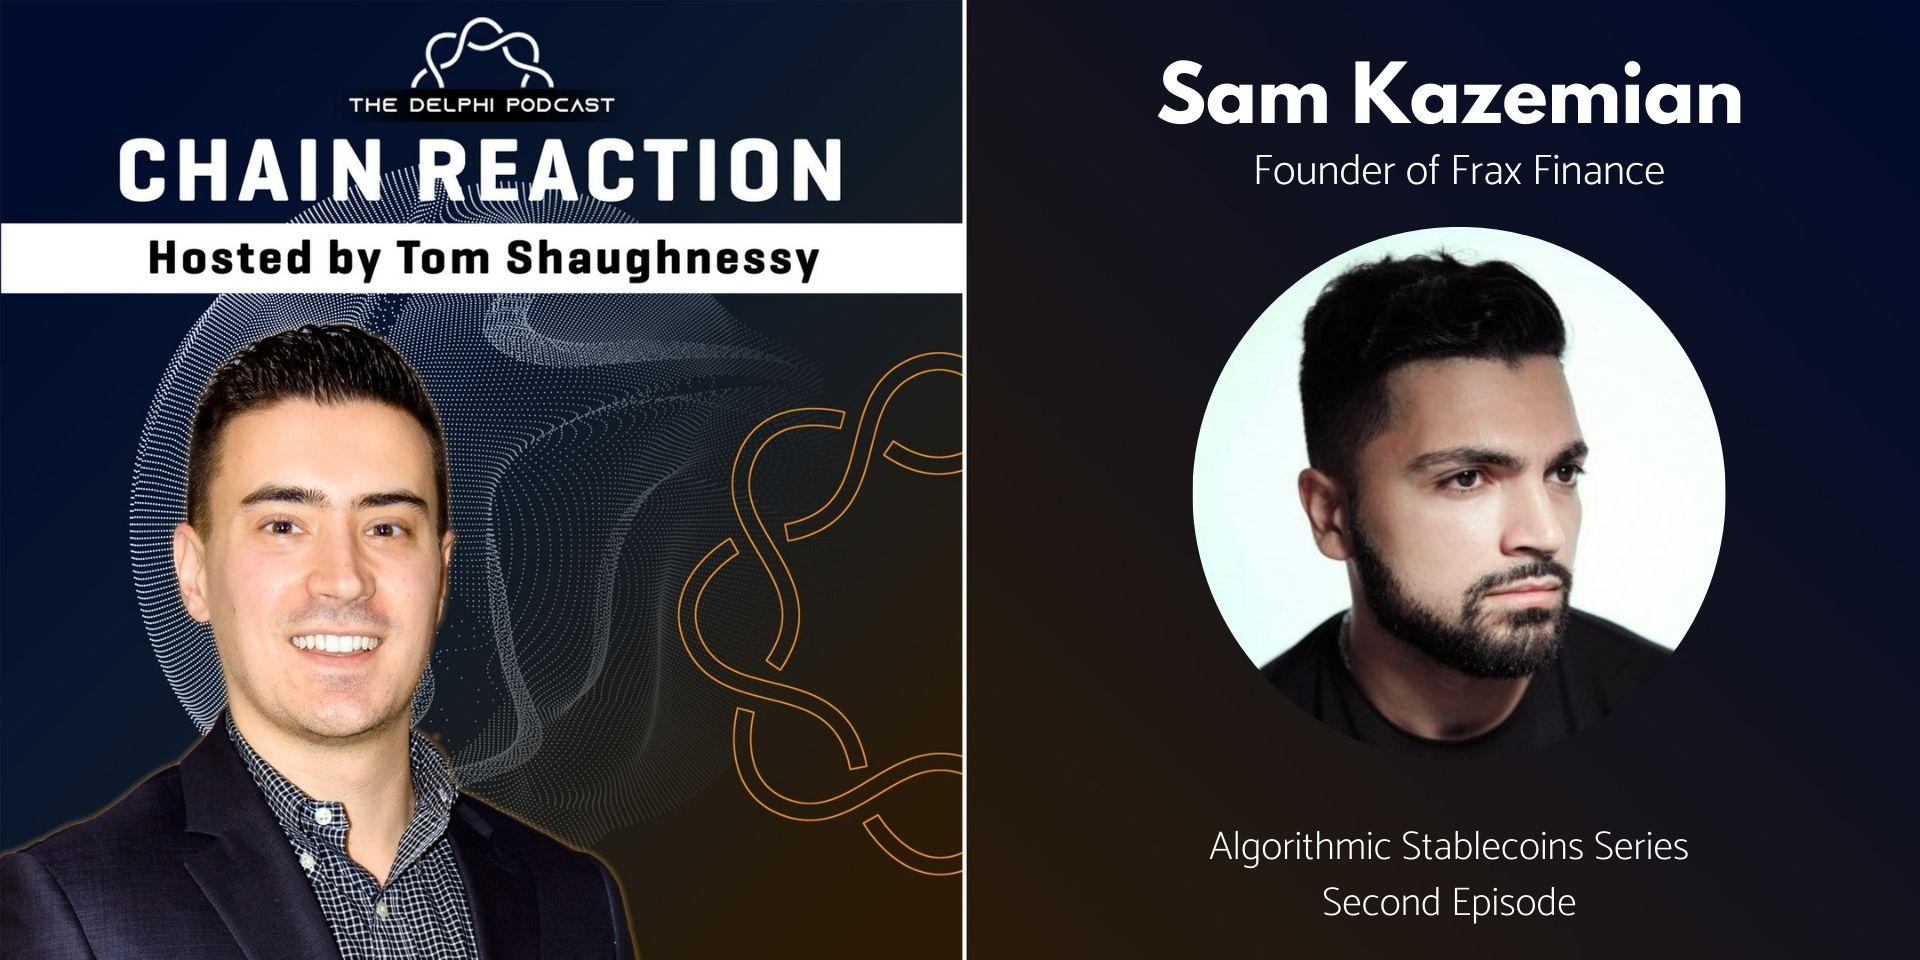 Algorithmic Stablecoins Series: Sam Kazemian of Frax Finance